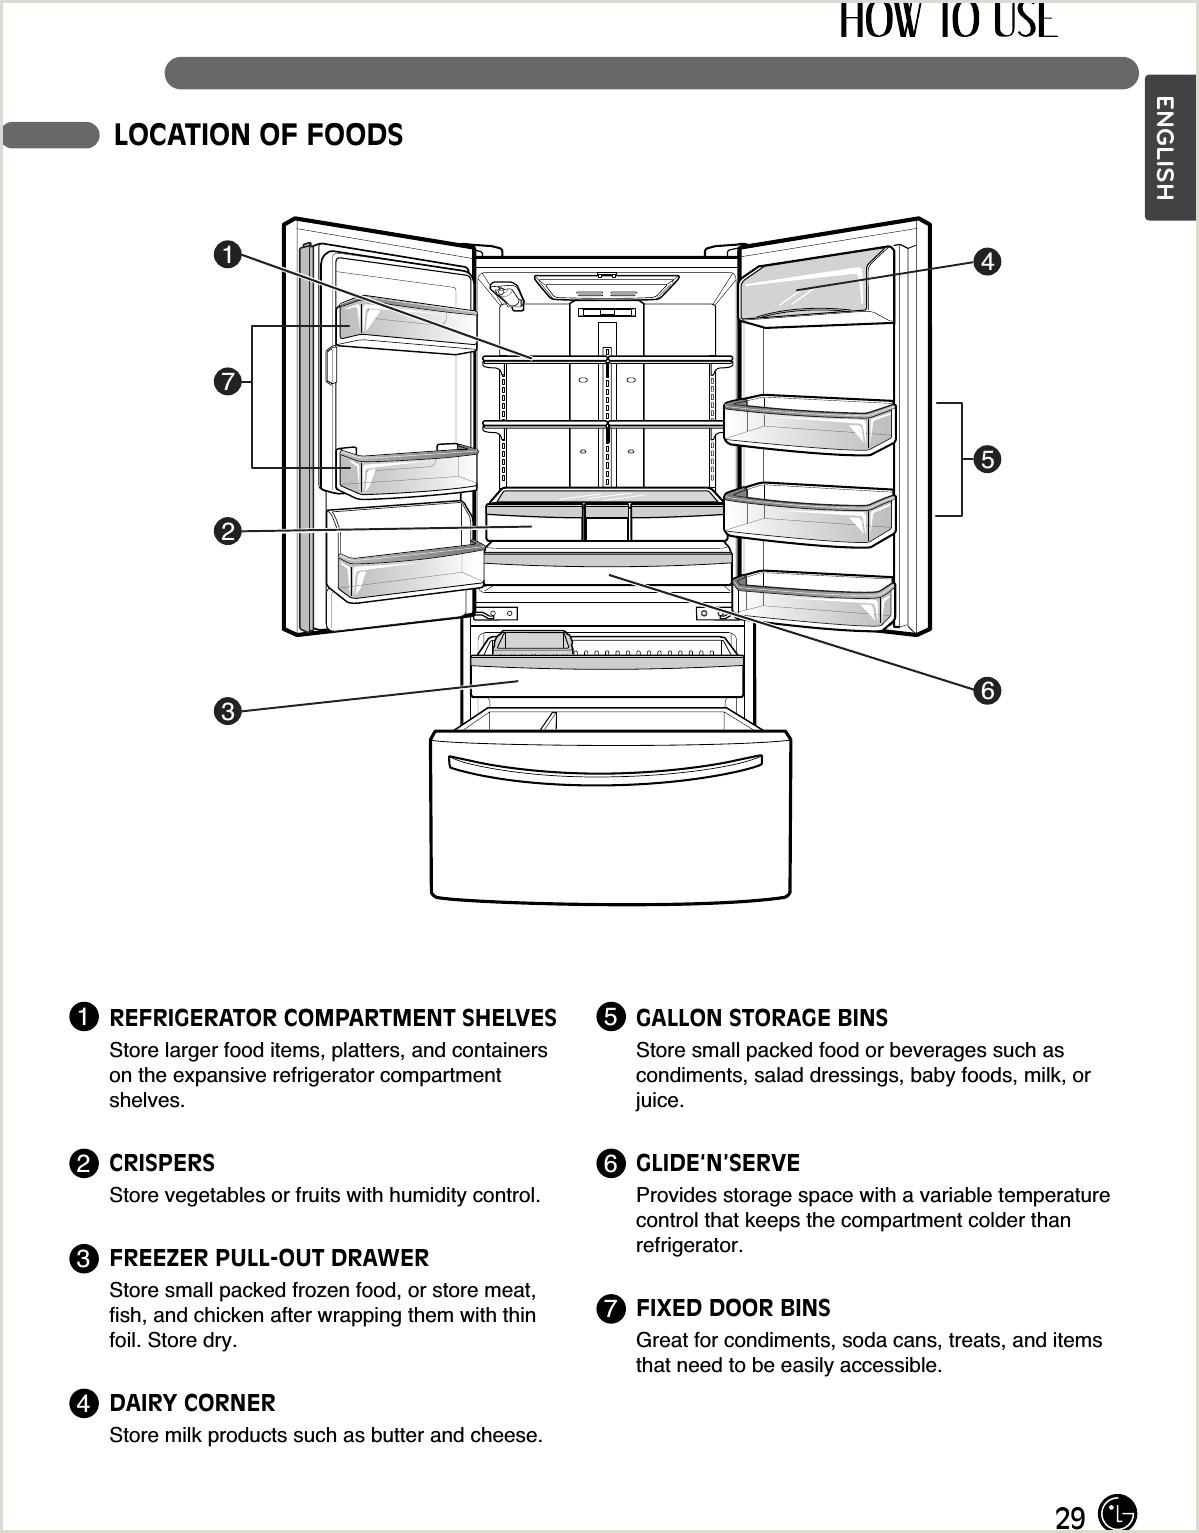 LG LFX ST 1 MFL ¿µ¾ User Manual Owner s